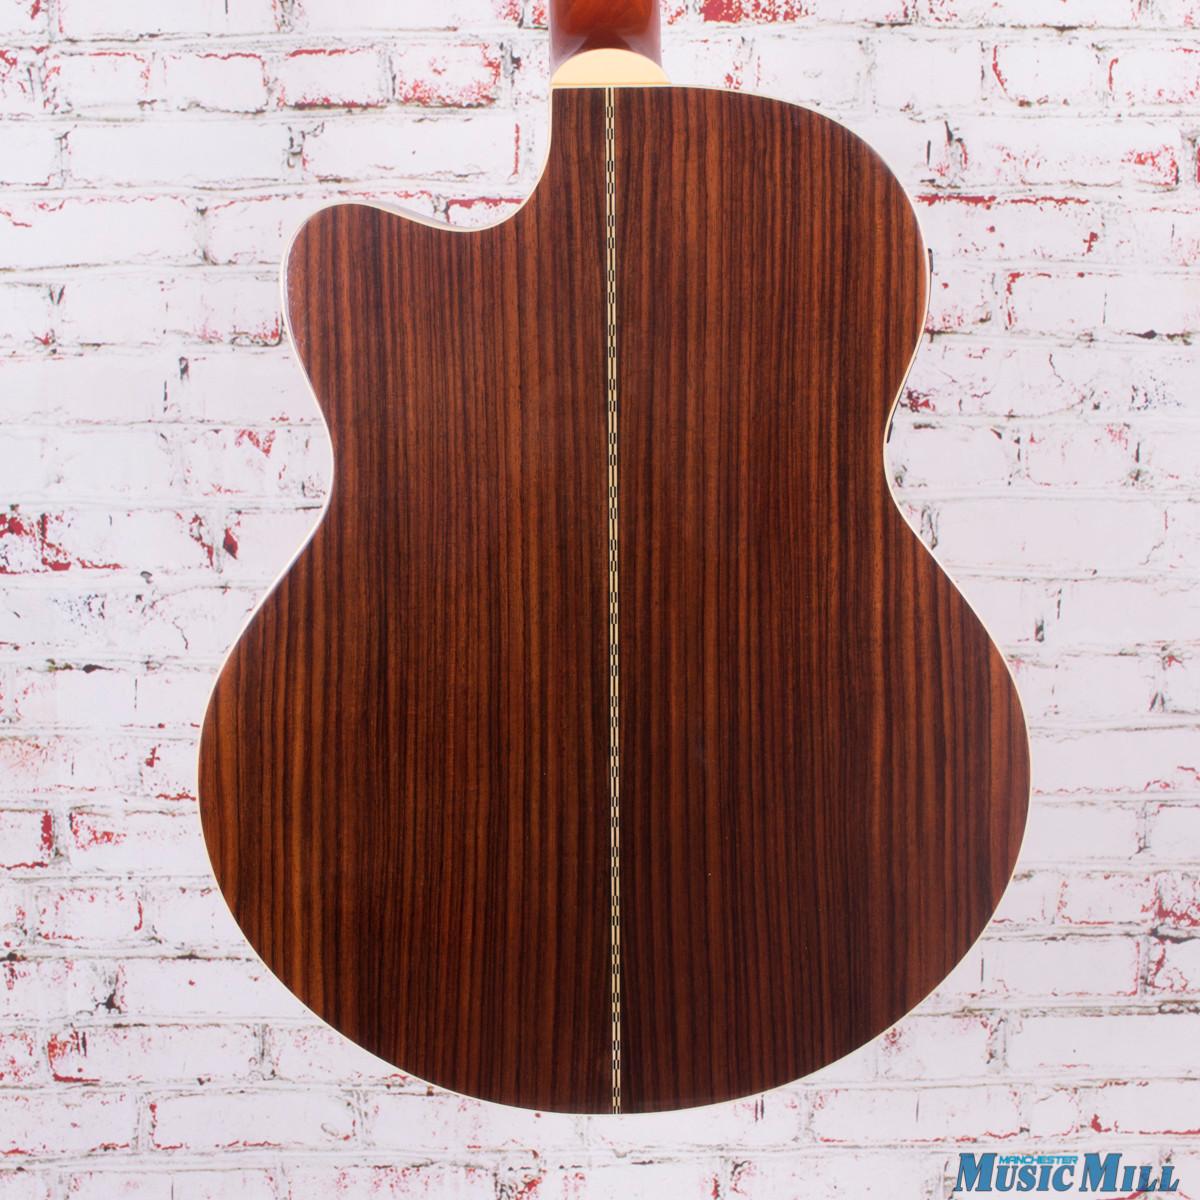 Cort SJ10x12 12 String Acoustic Electric Guitar Natural